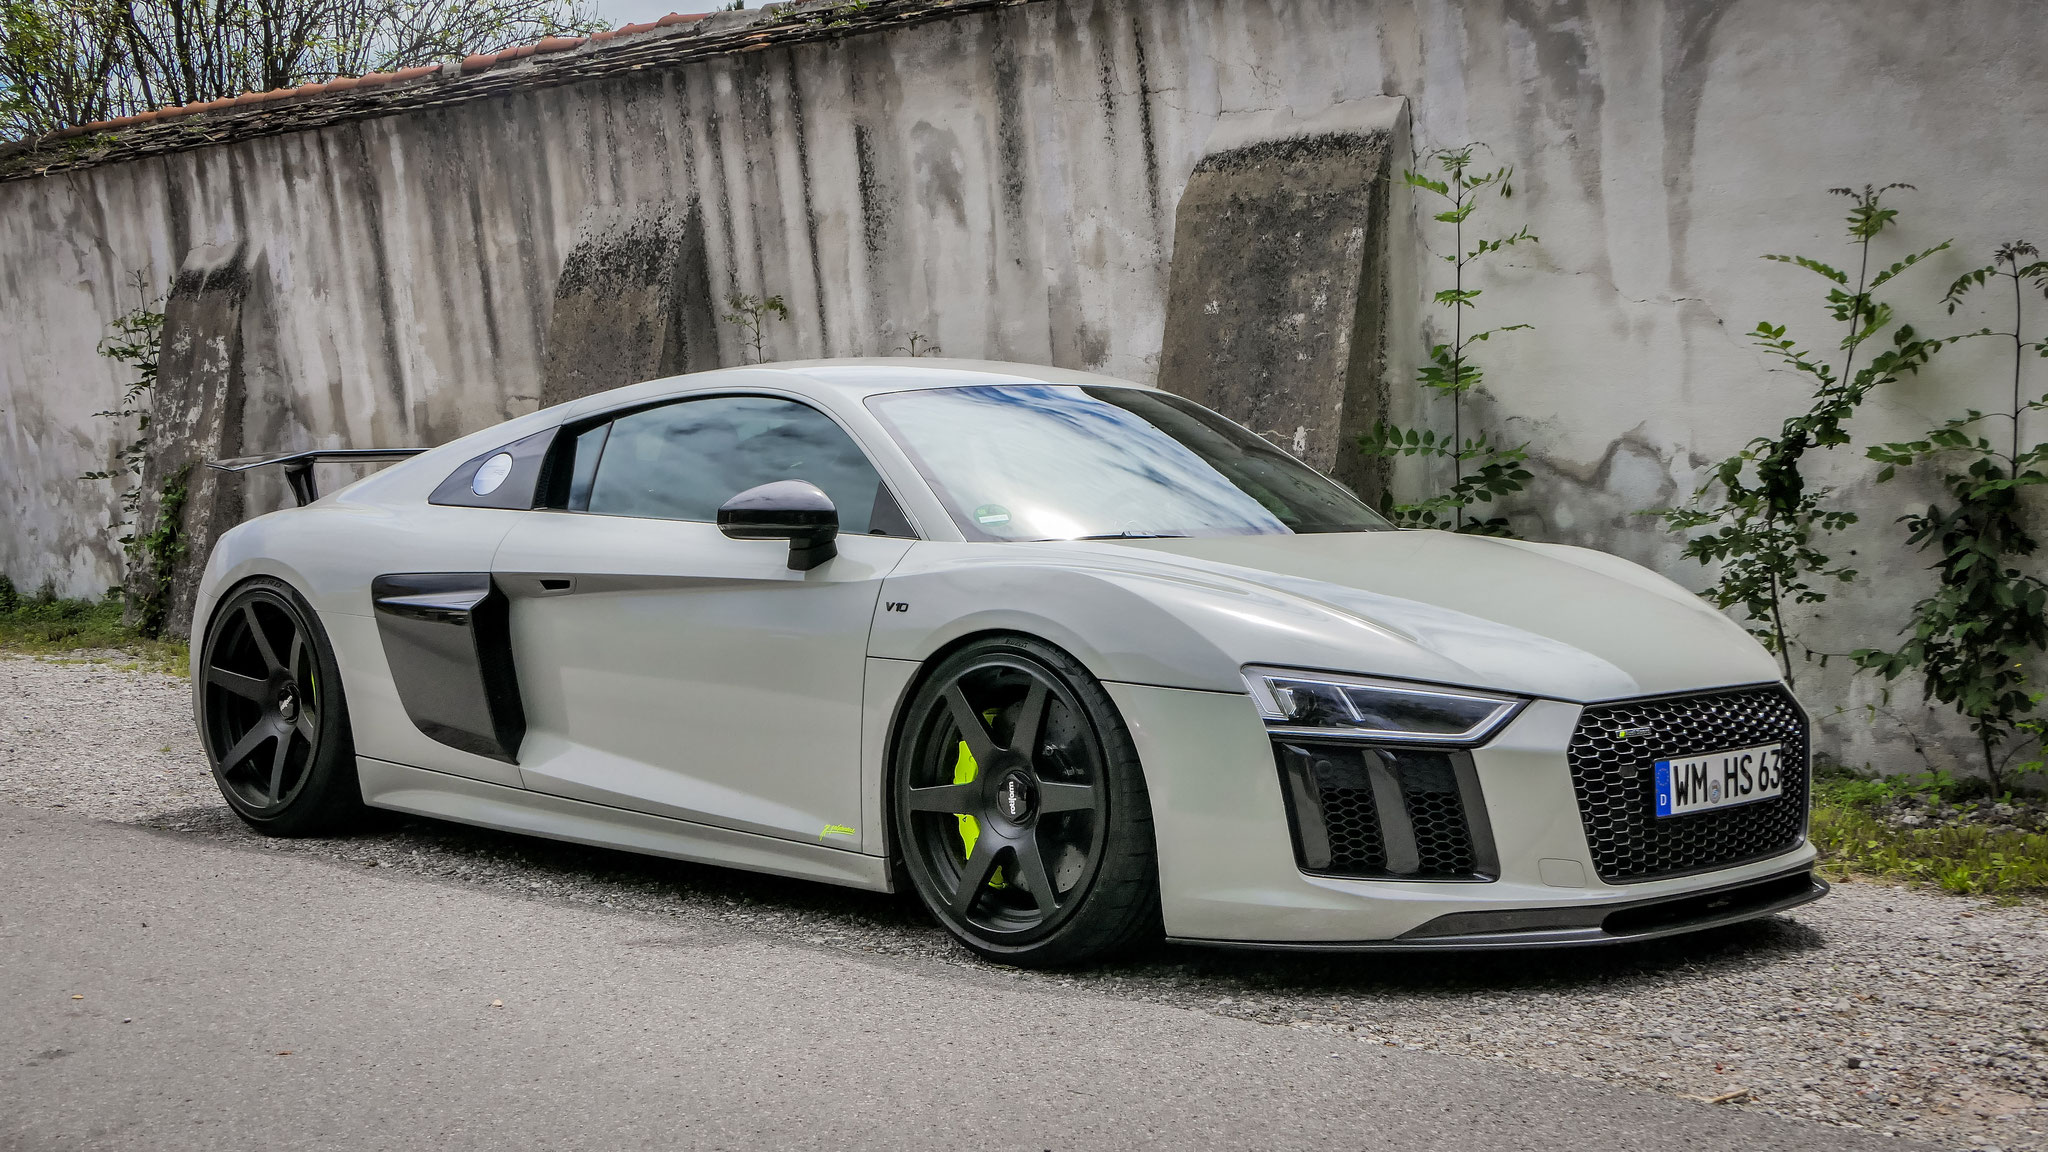 Audi R8 V10 JP Performance - WM-HS-63